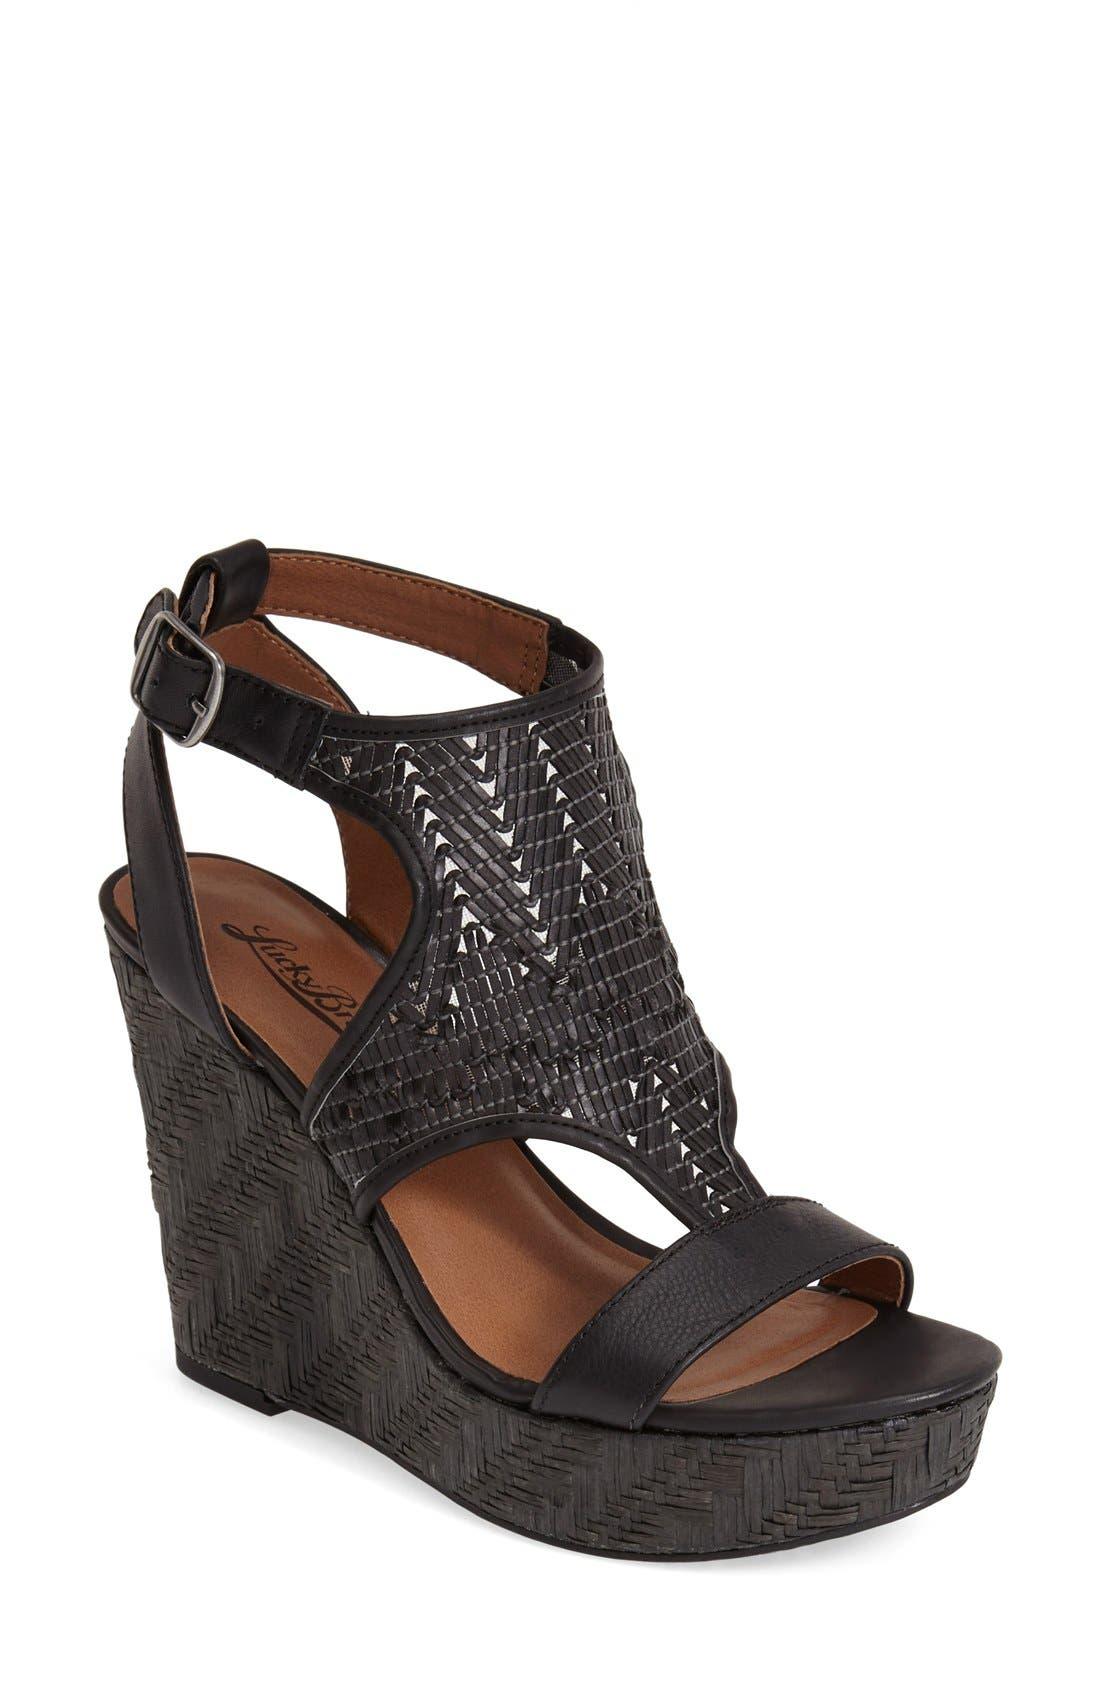 Alternate Image 1 Selected - Lucky Brand 'Laffertie' T-Strap Wedge Sandal (Women)